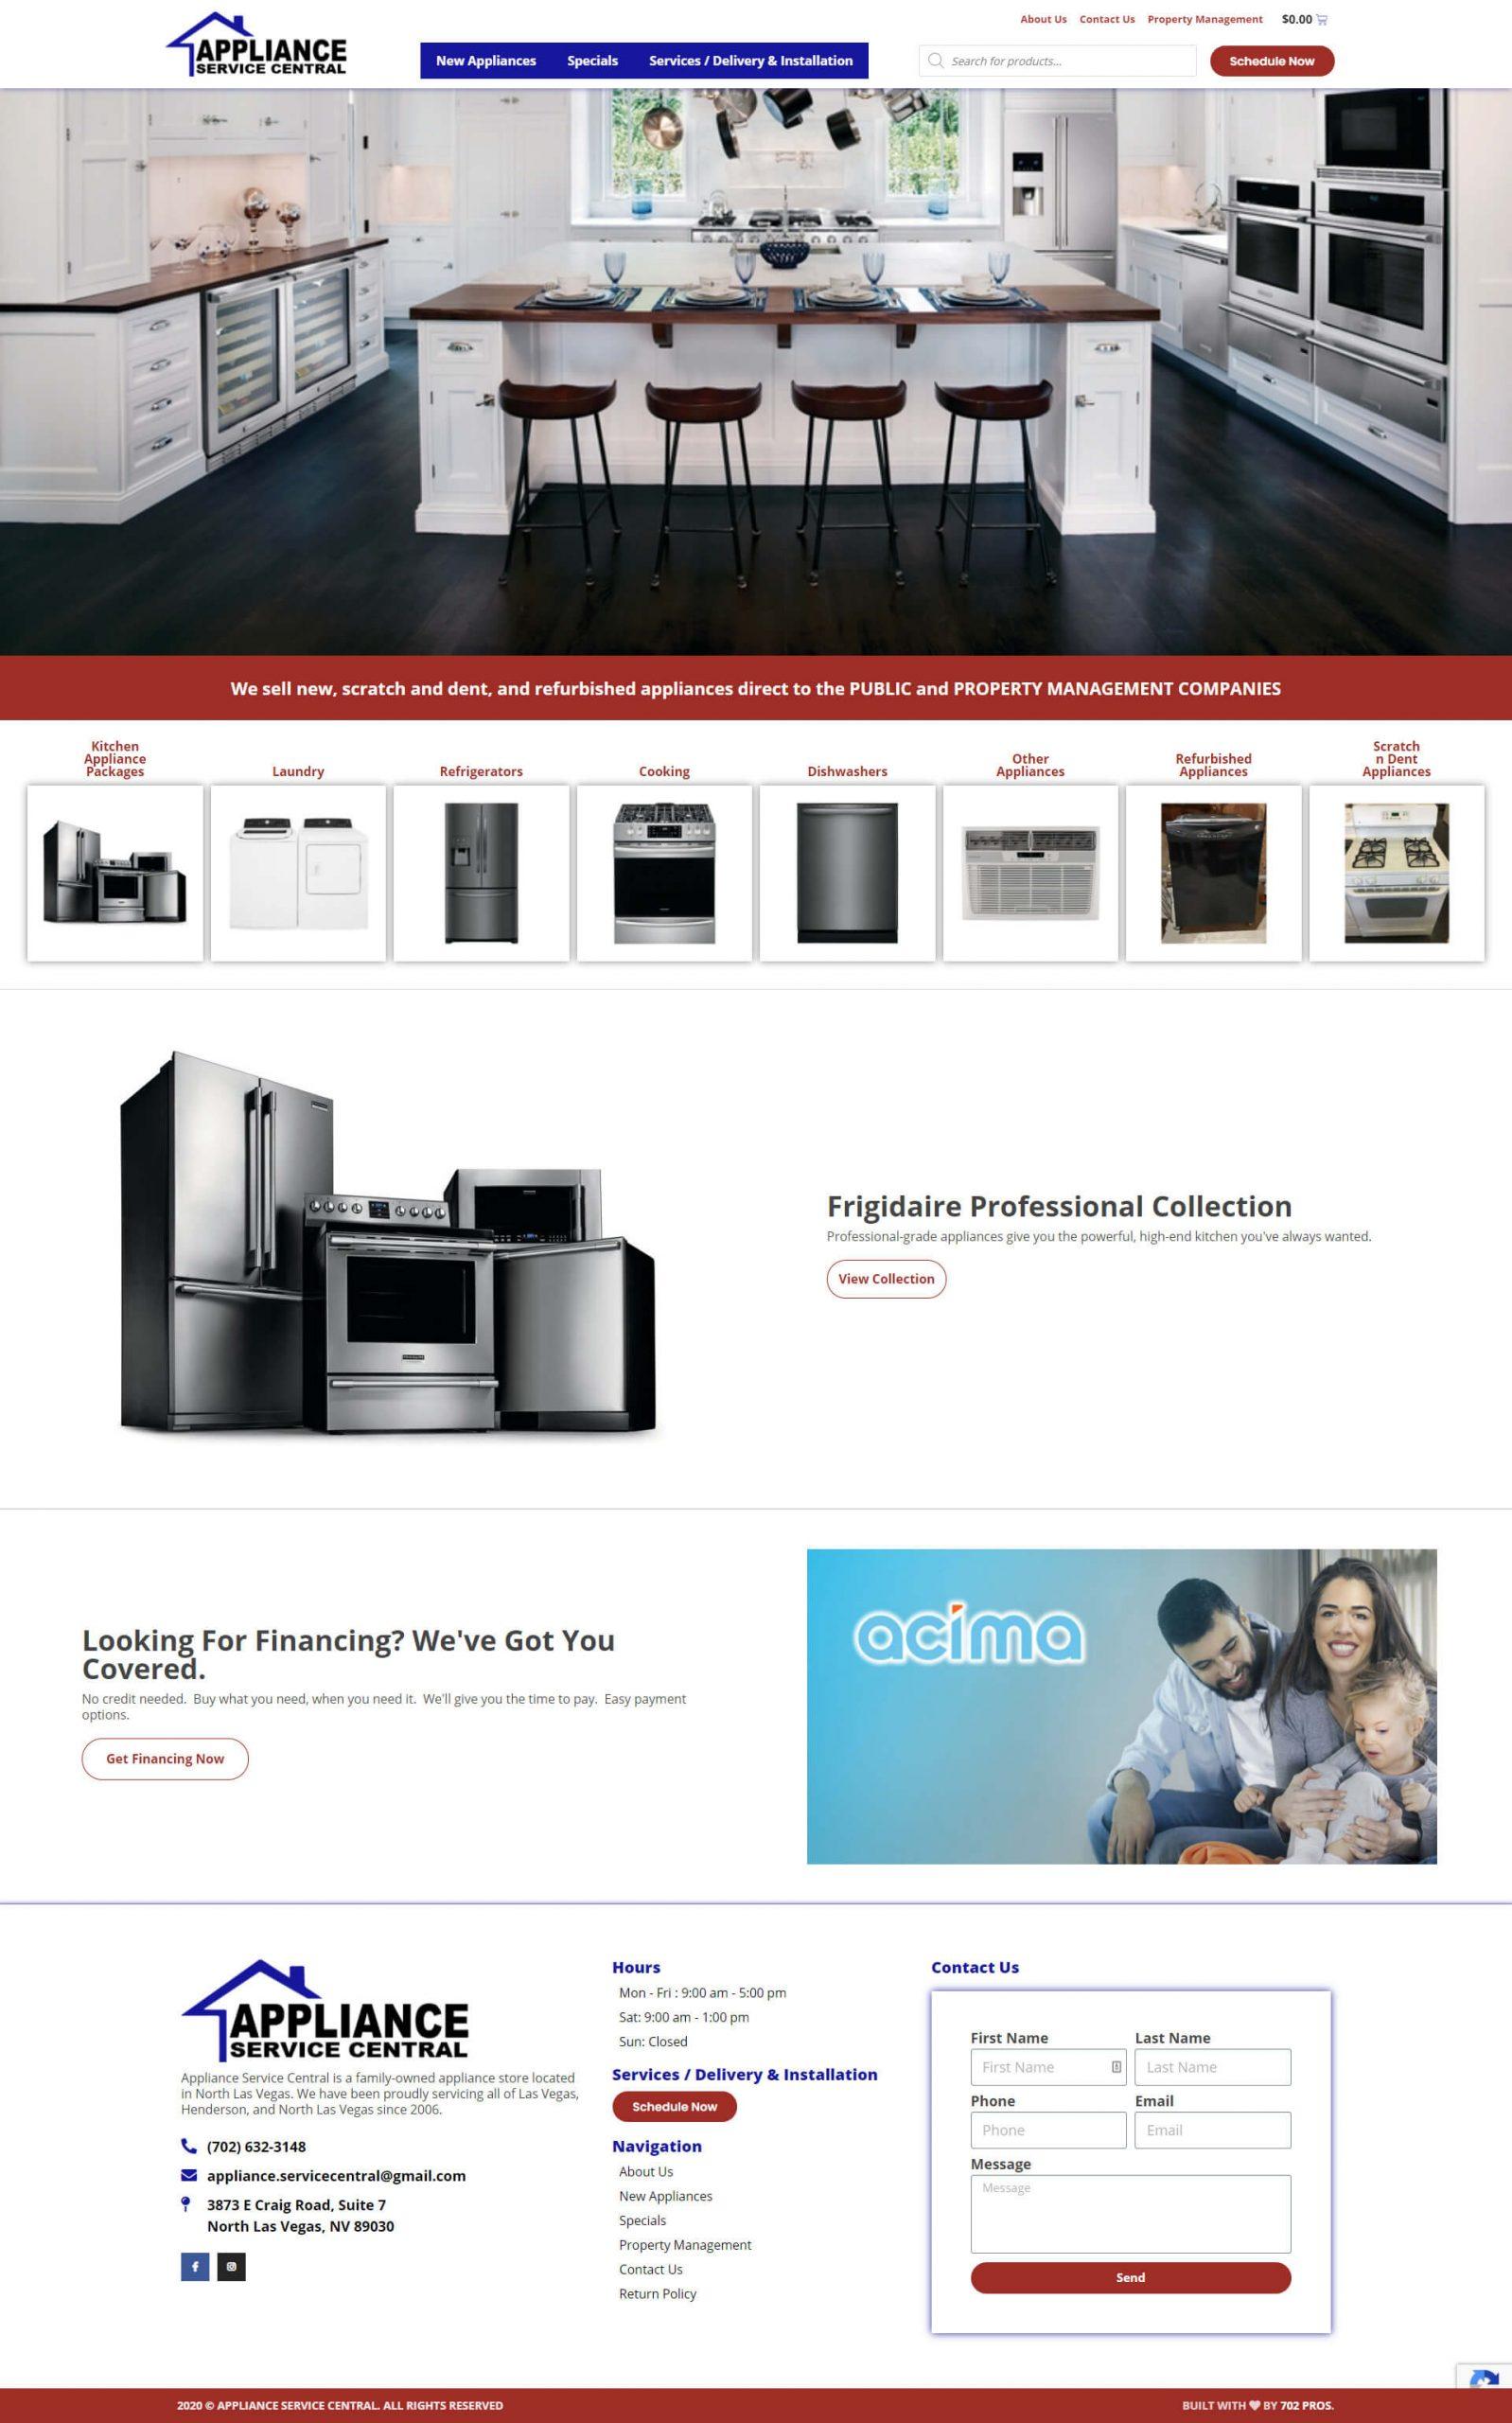 Appliance Service Central Desktop